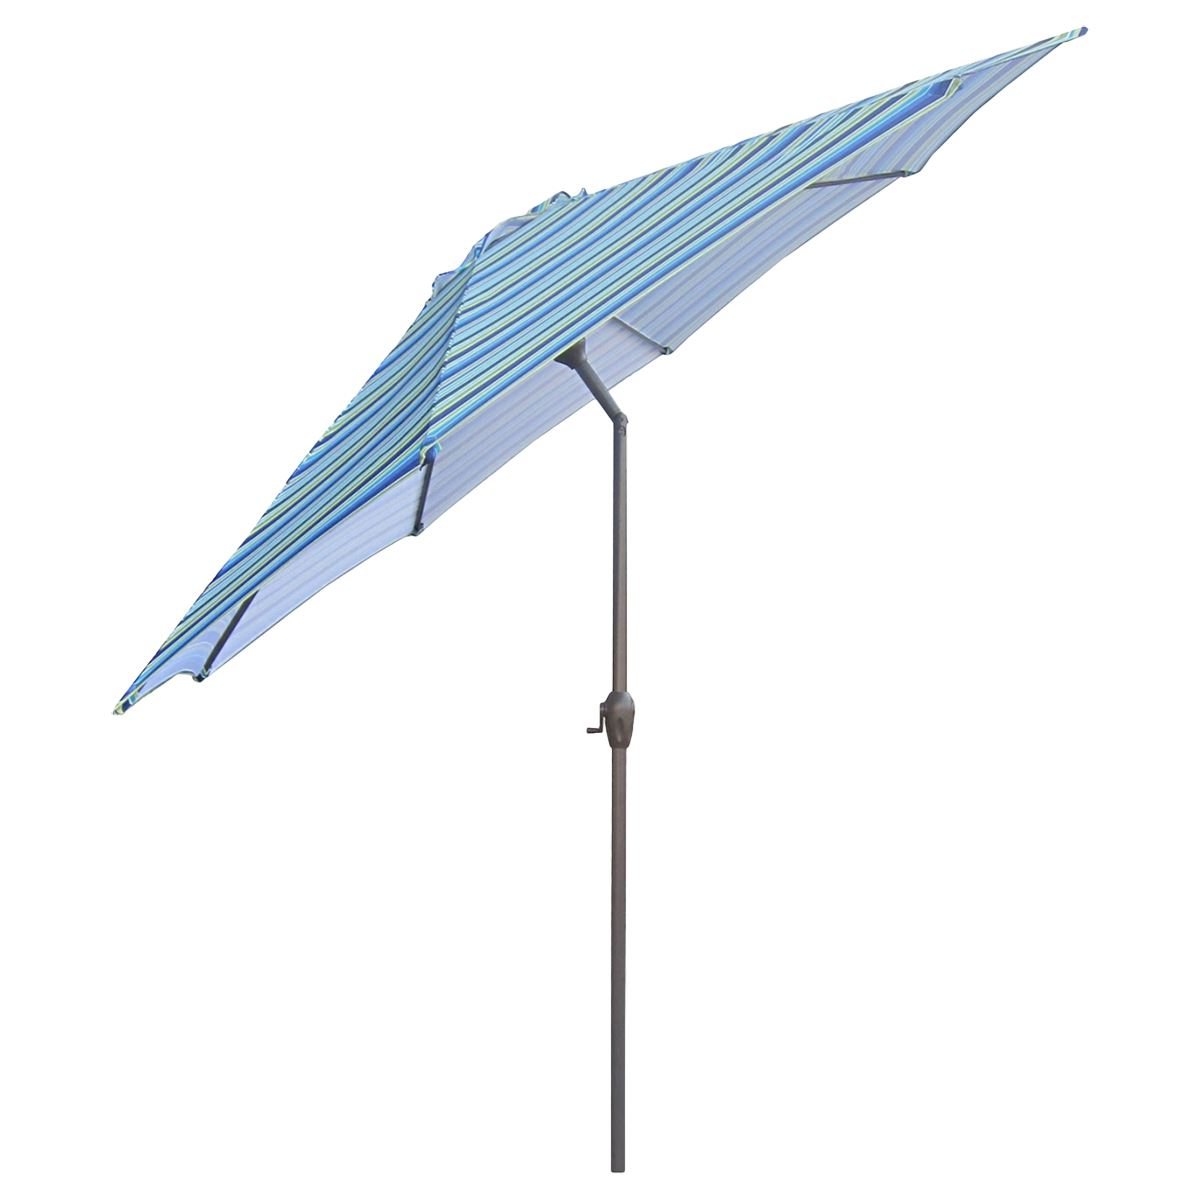 2019 Lb International 9ft. Striped Patio Umbrella W/ Hand Crank & Tilt For Caravelle Market Umbrellas (Gallery 18 of 20)